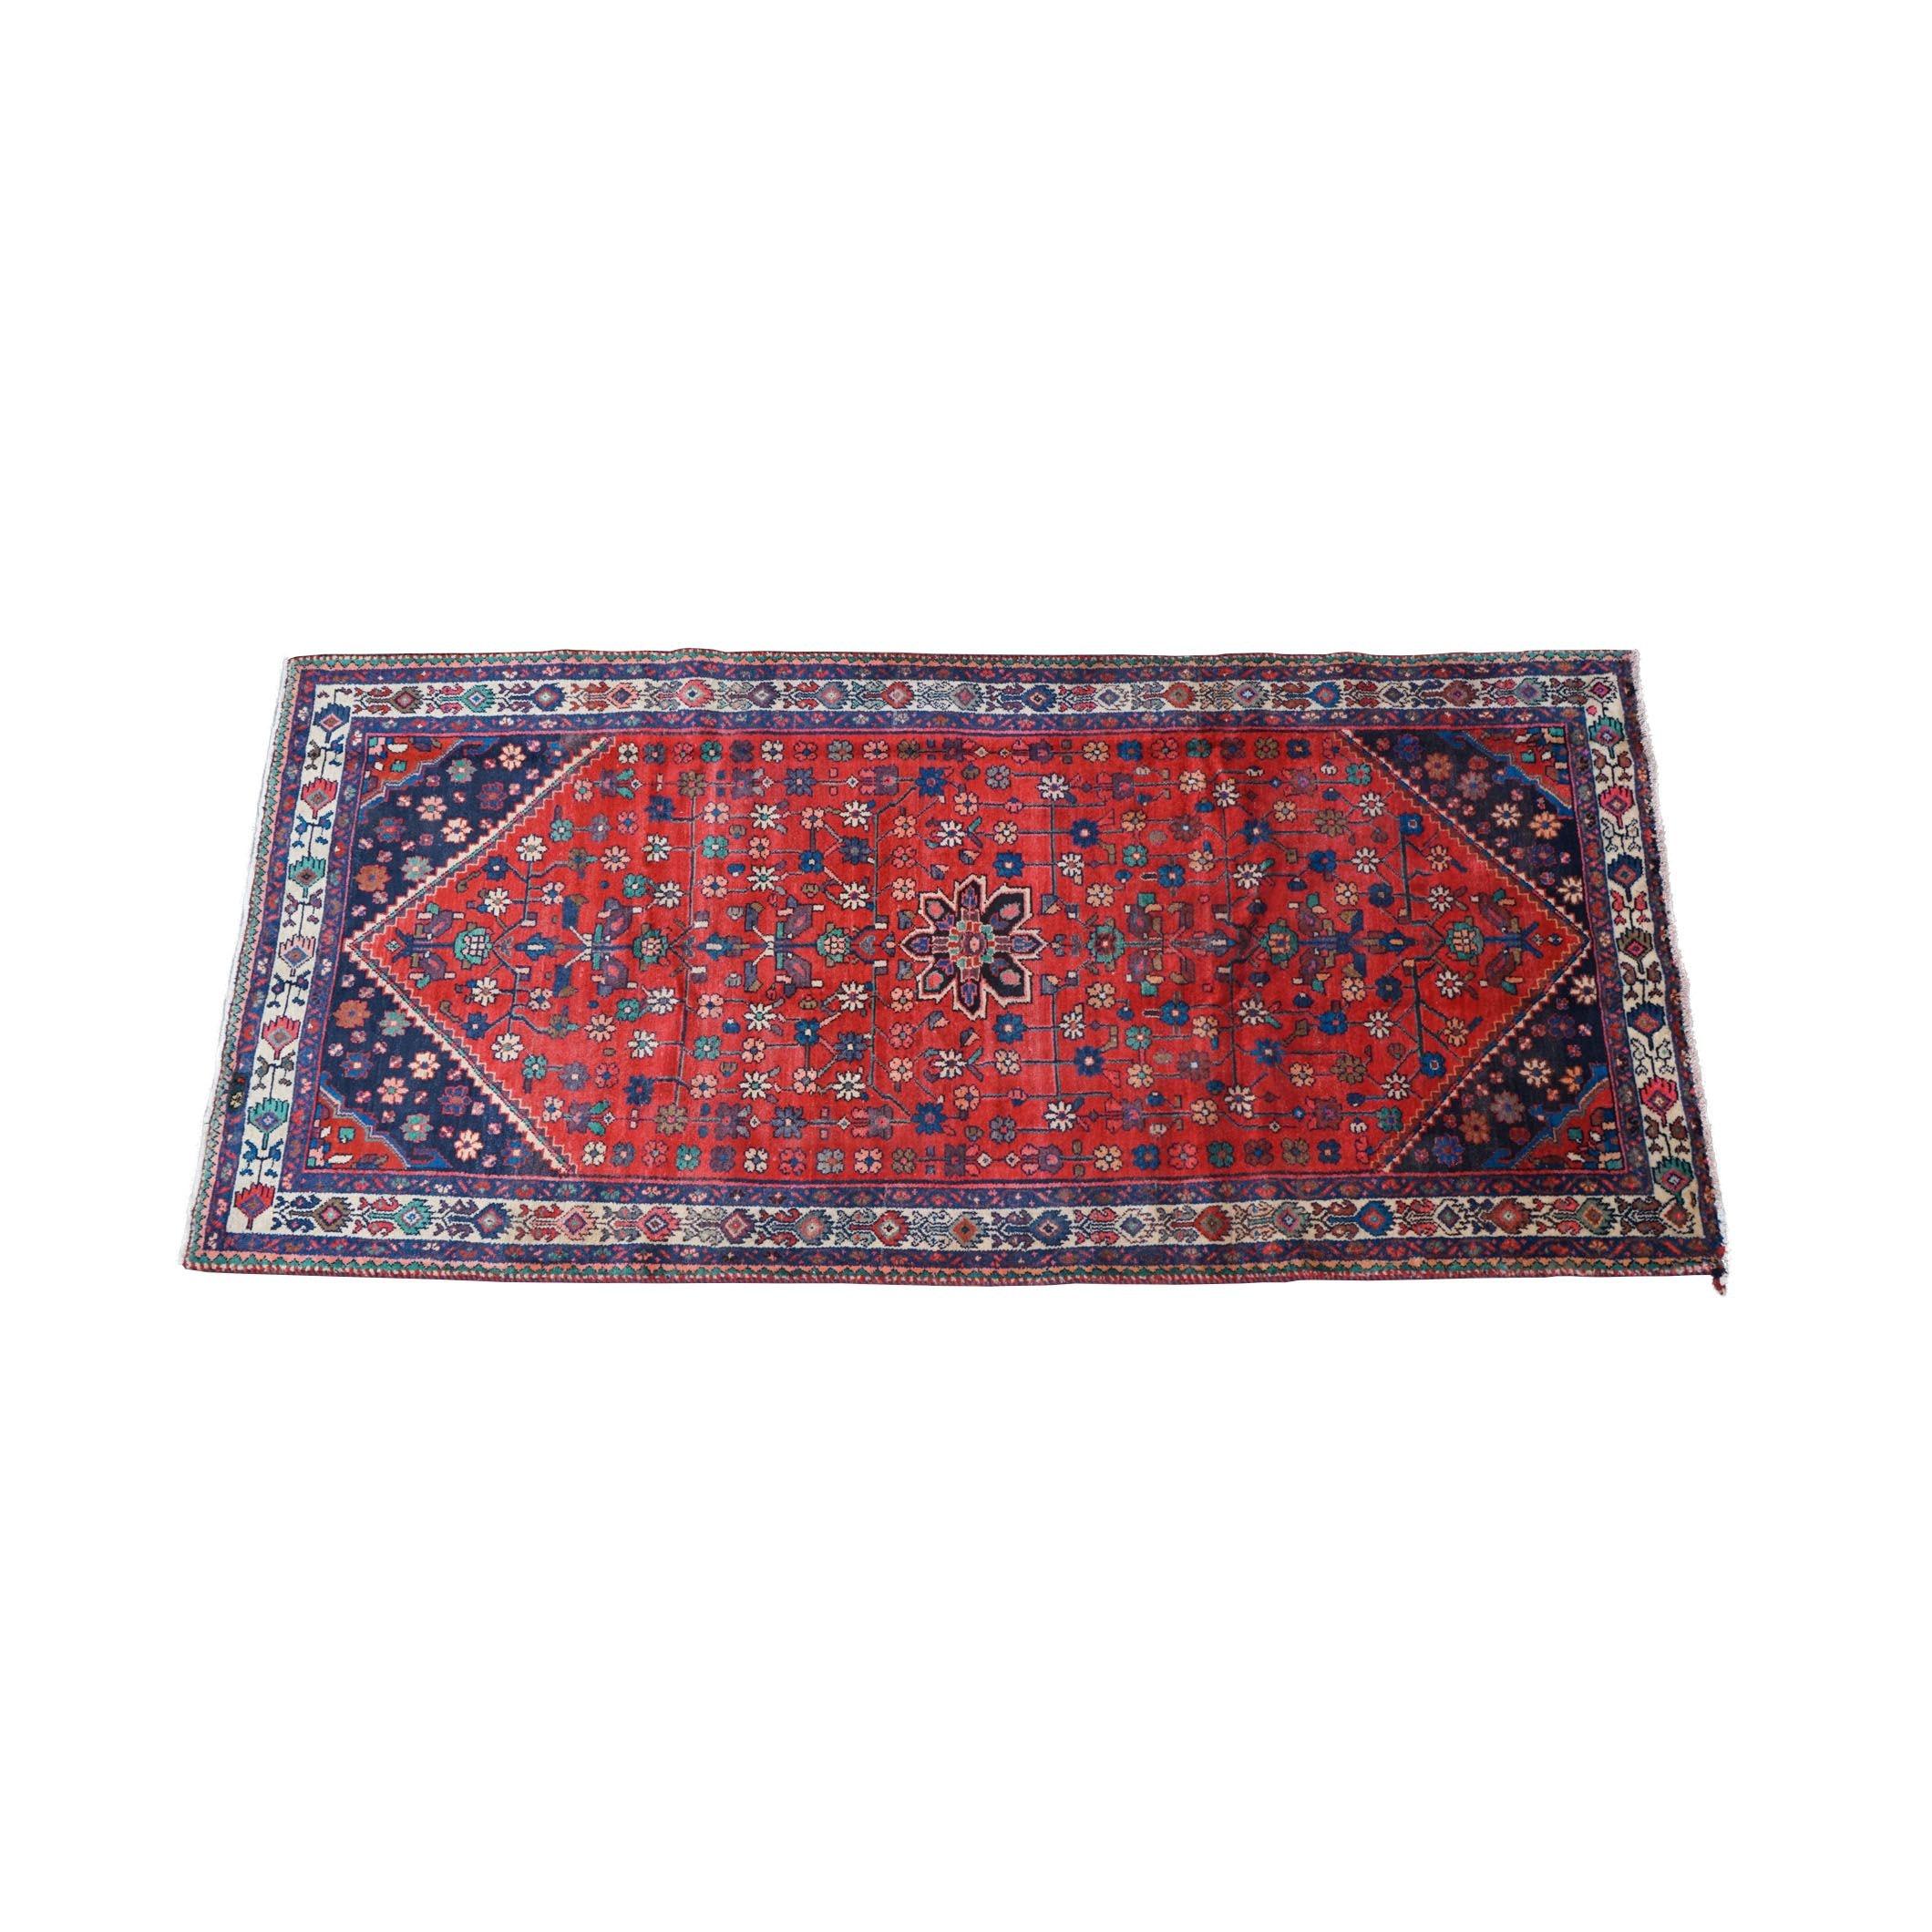 Hand-Knotted Caucasian Karabagh Wool Long Rug